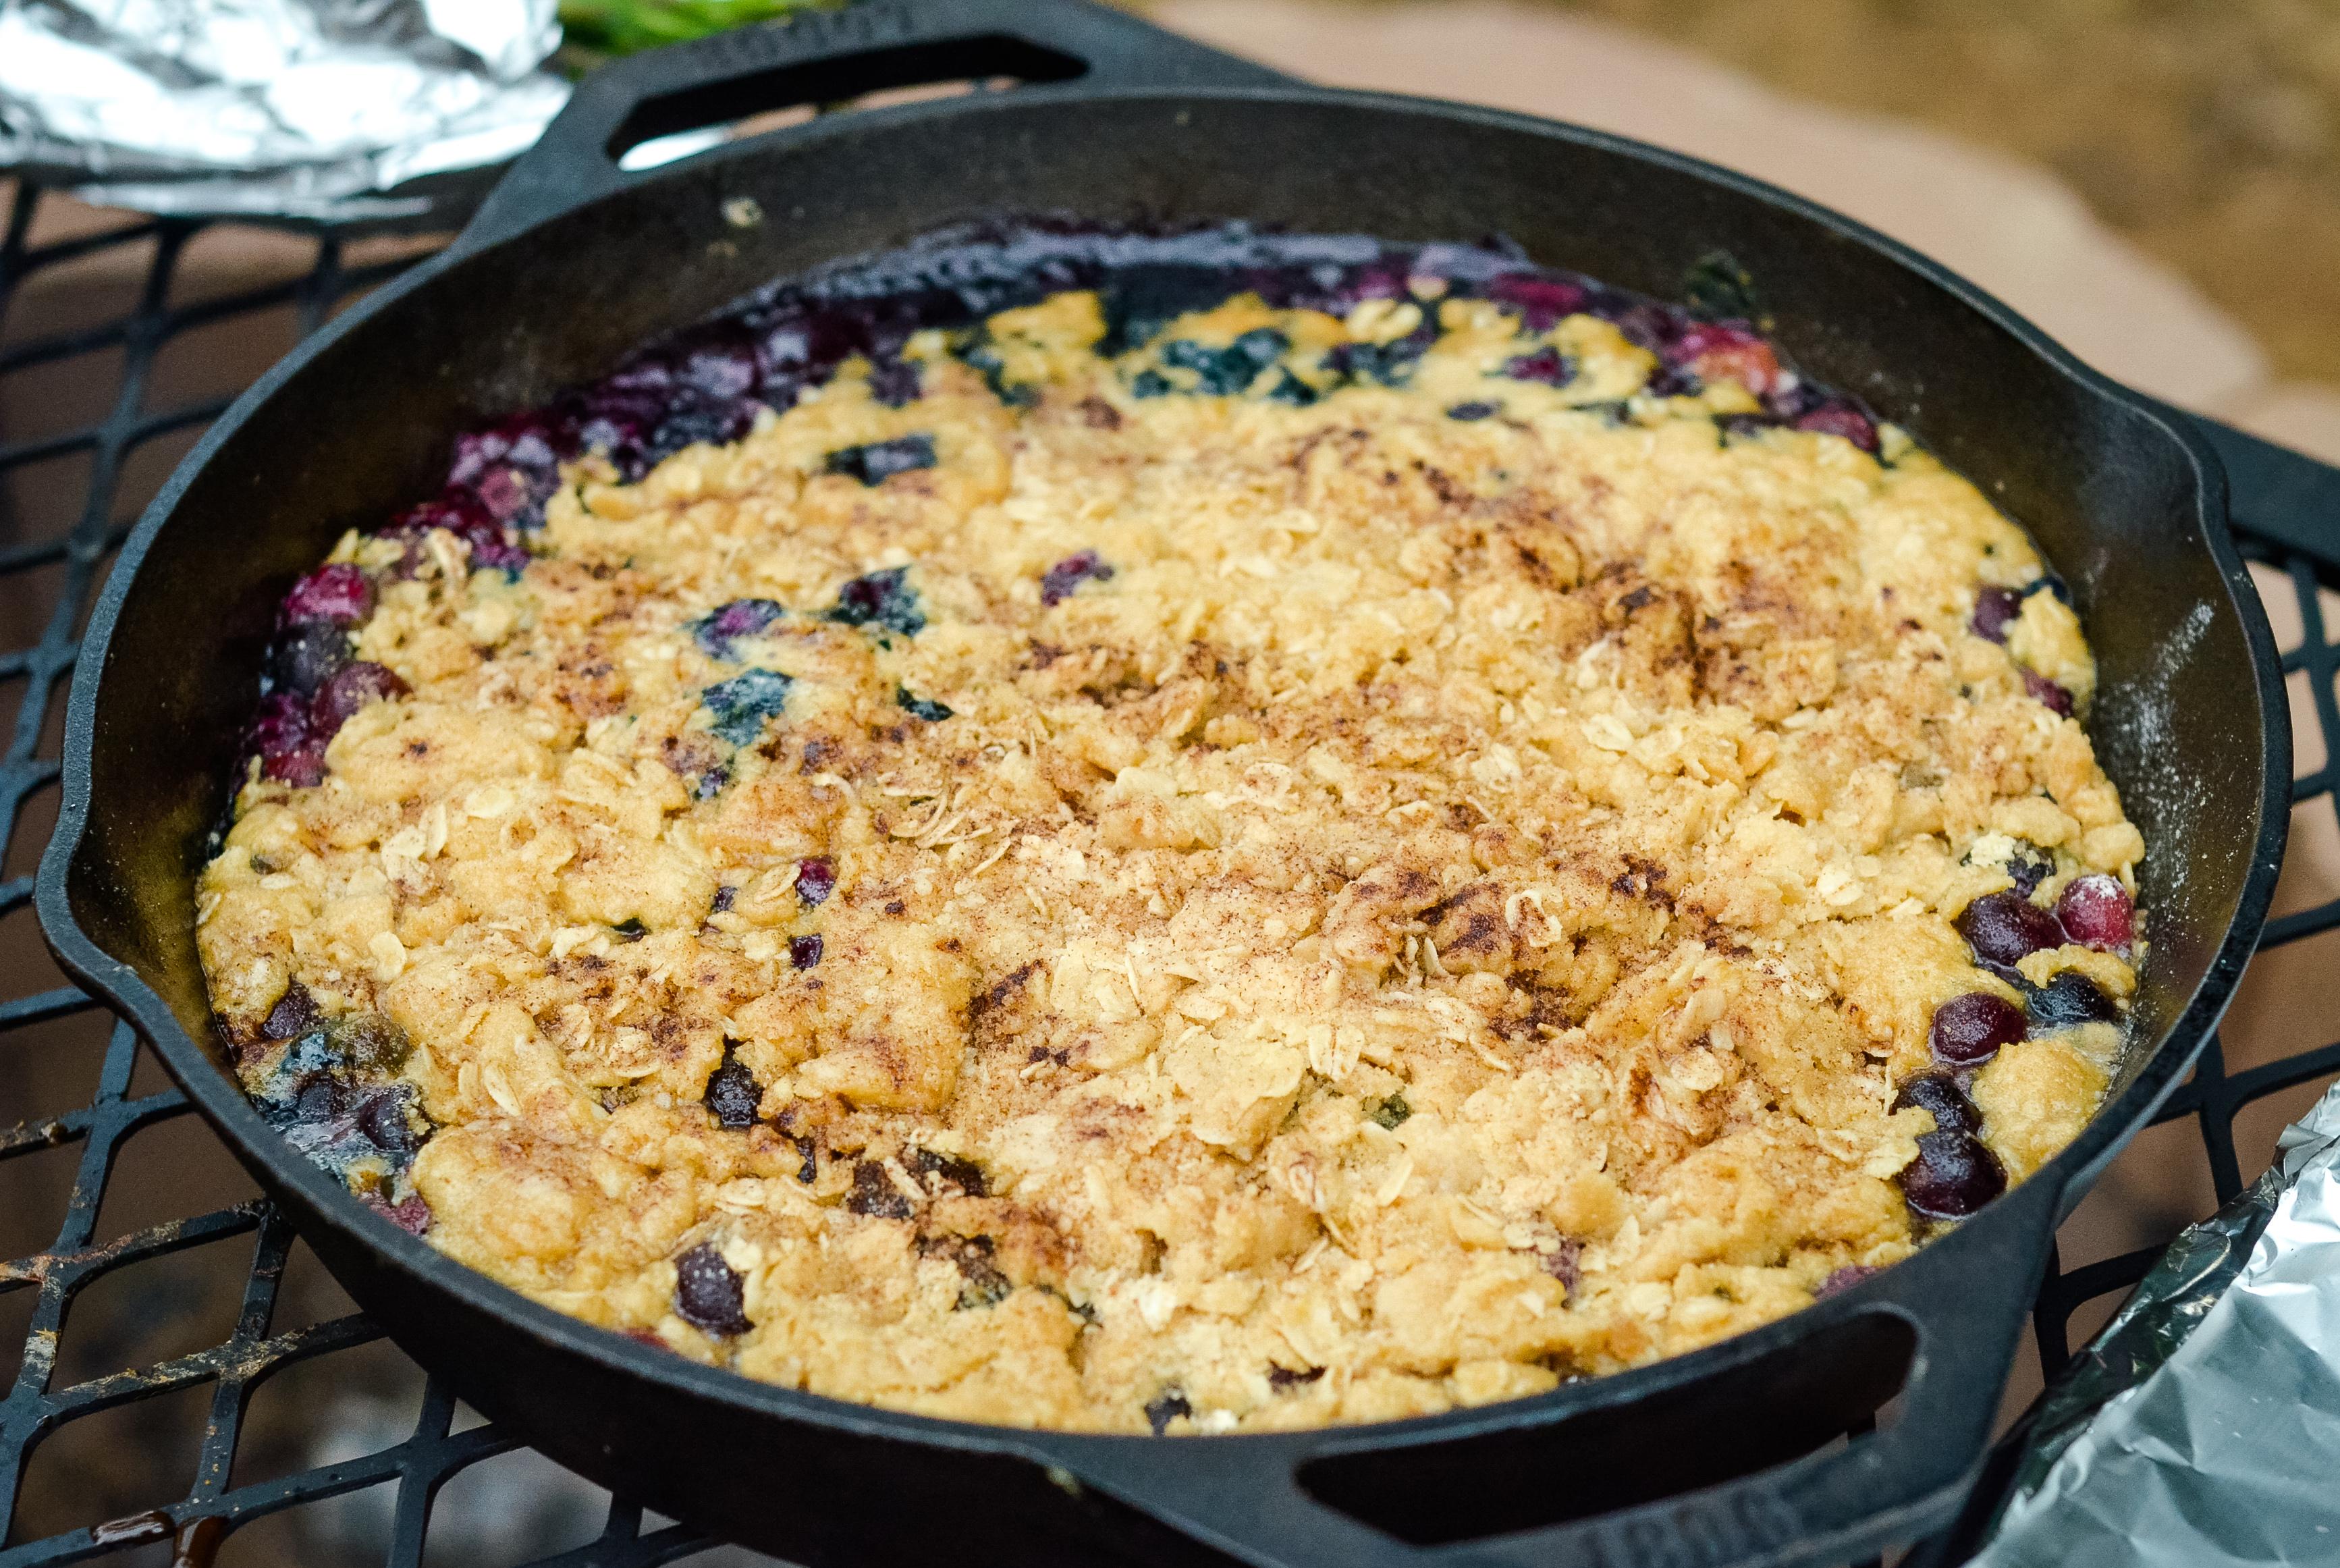 Campfire Blueberry Crisp